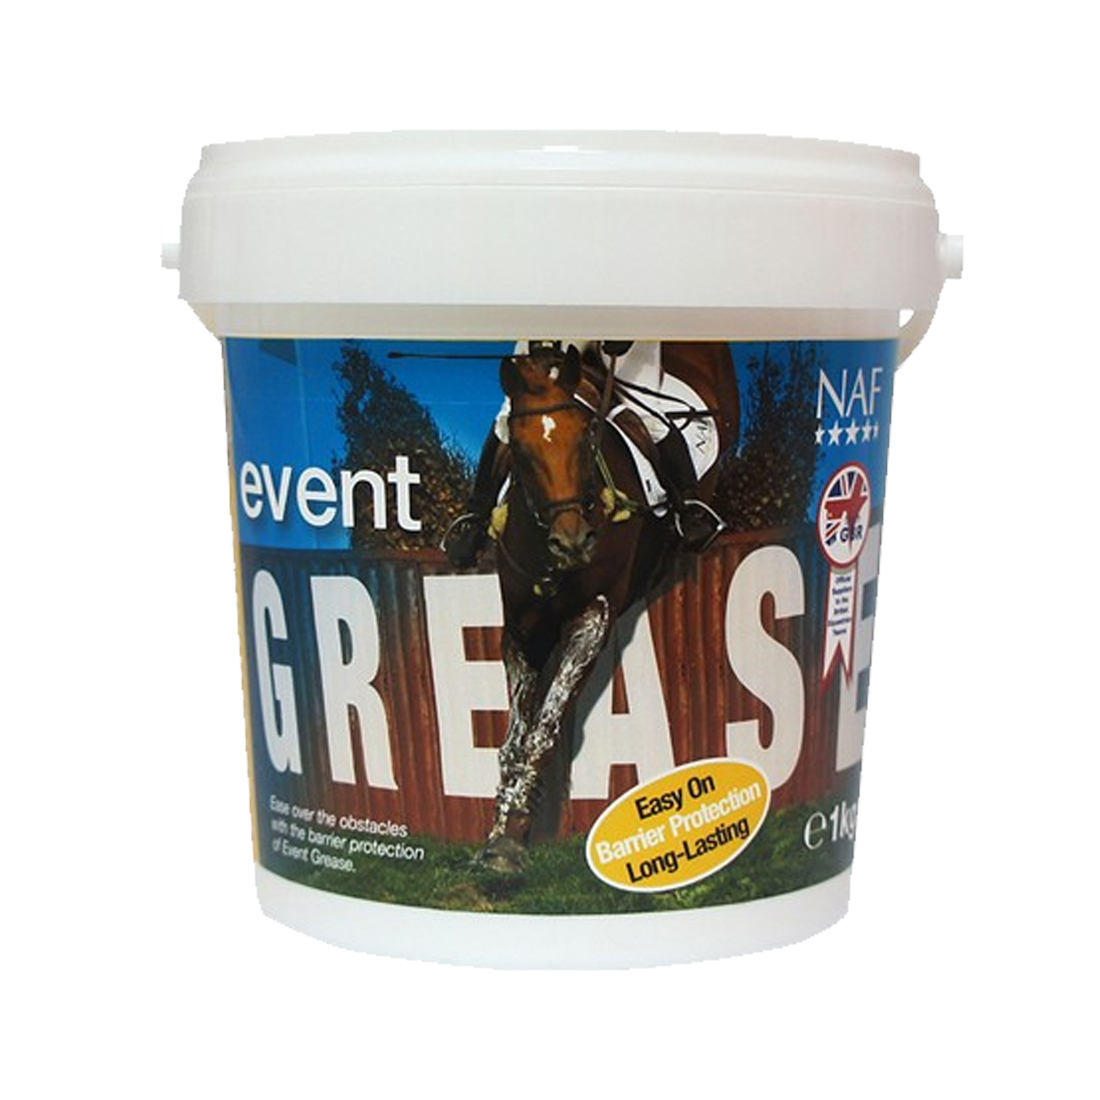 NAF eventing grease